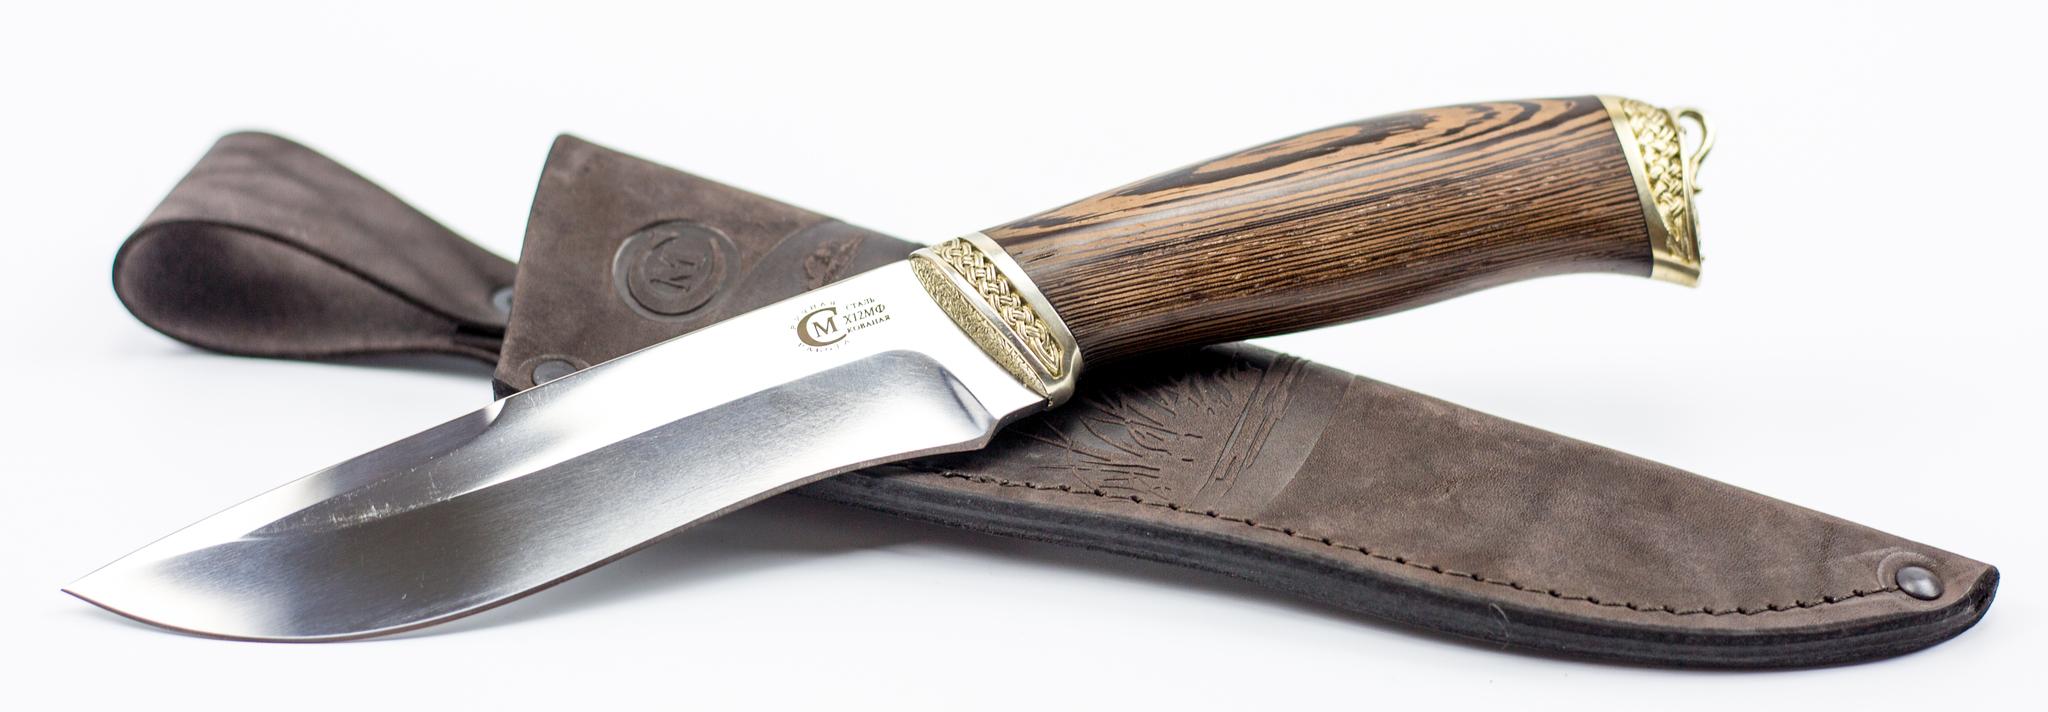 Фото 11 - Нож из Х12МФ